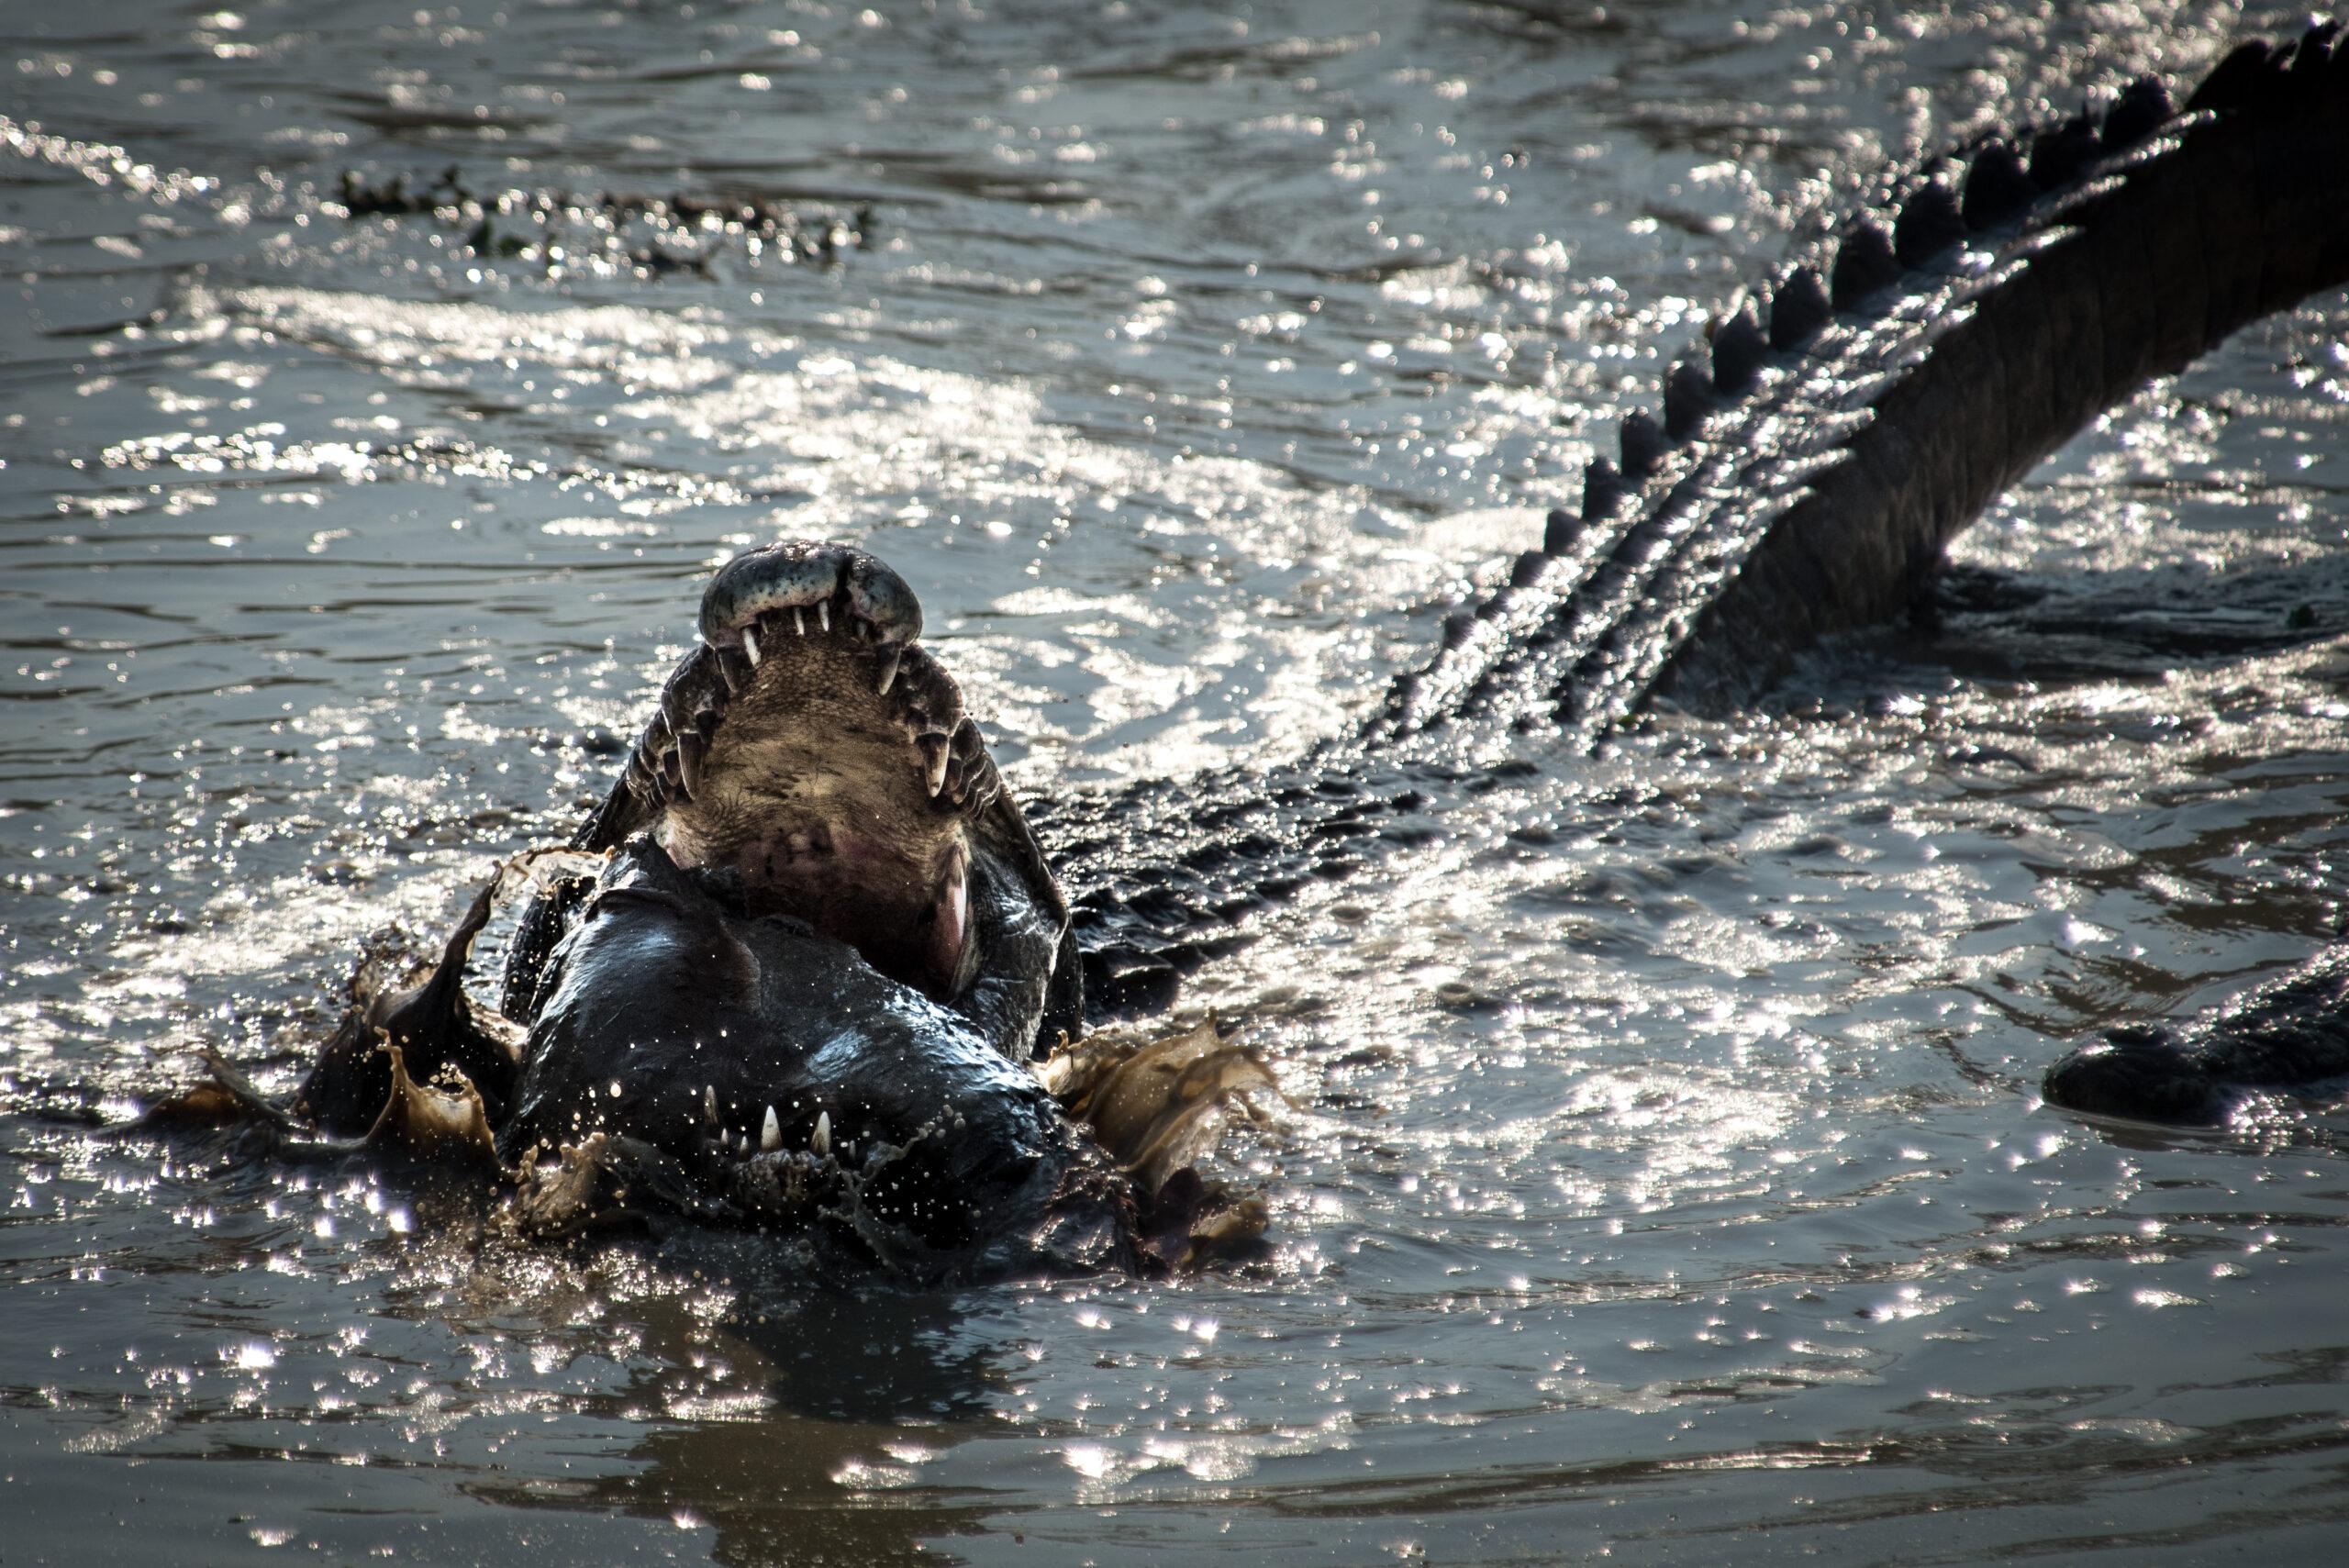 Crocodile sighting on safari